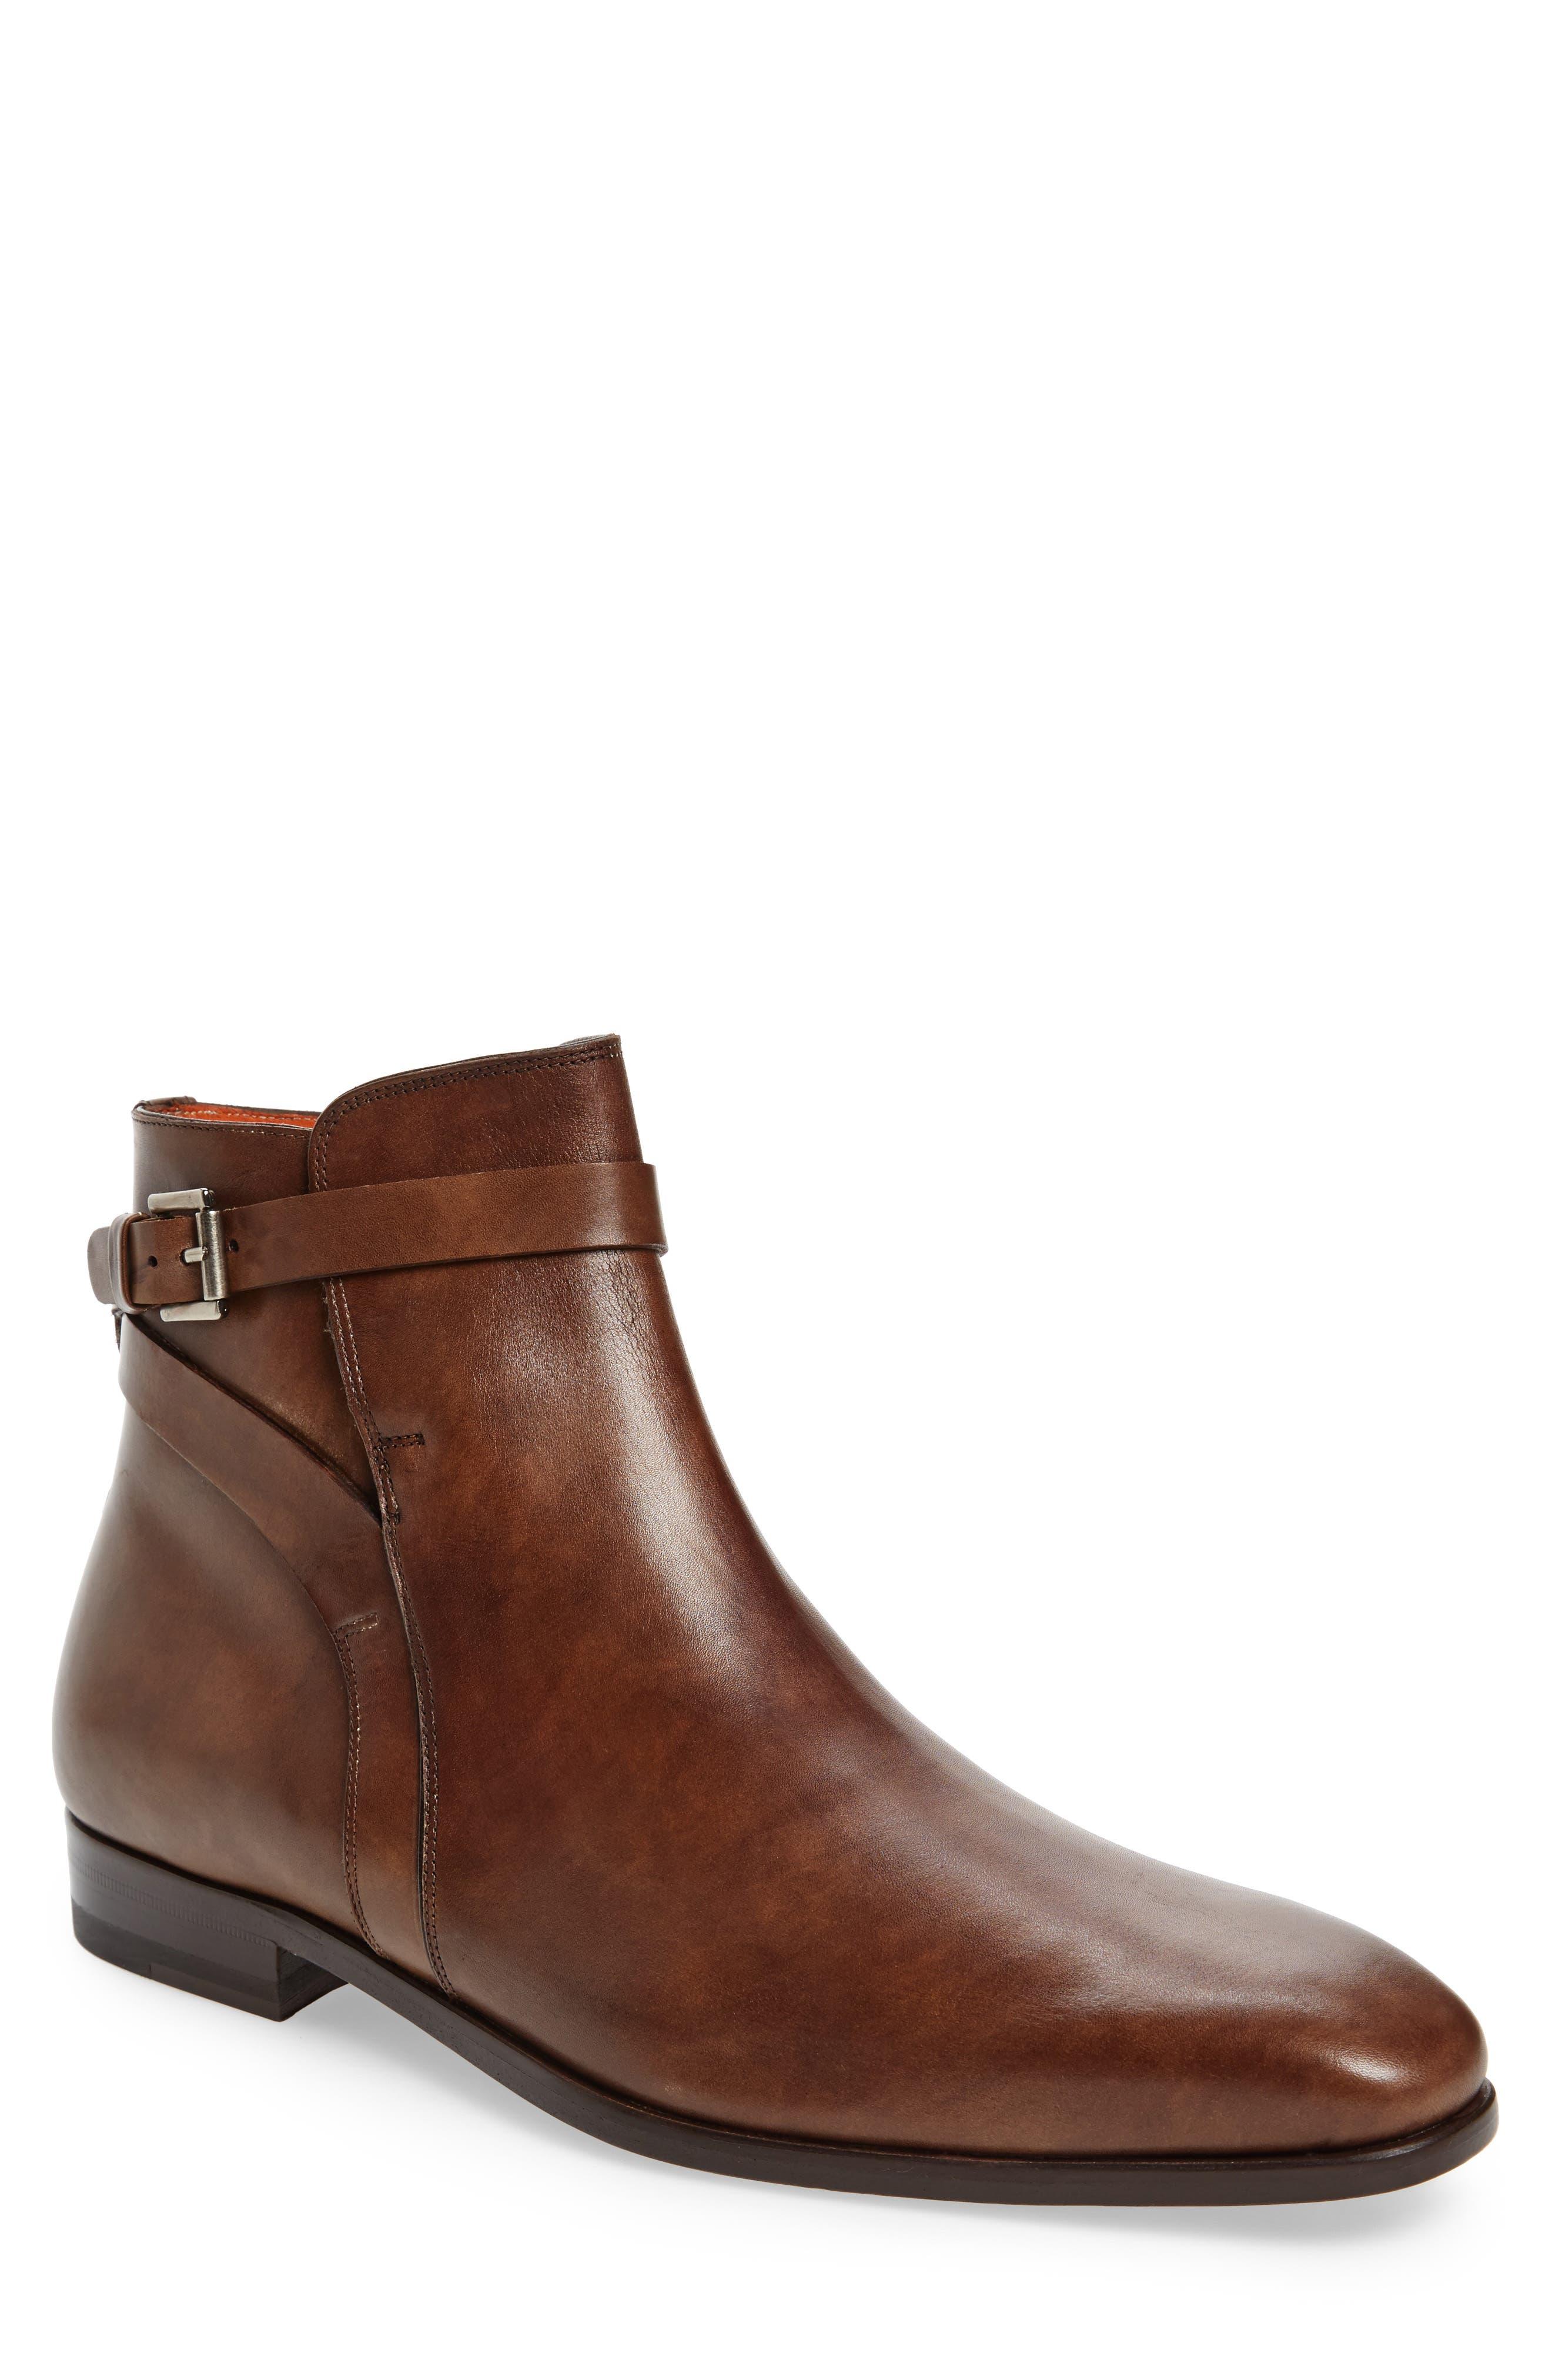 Viso Zip Boot,                         Main,                         color, 238